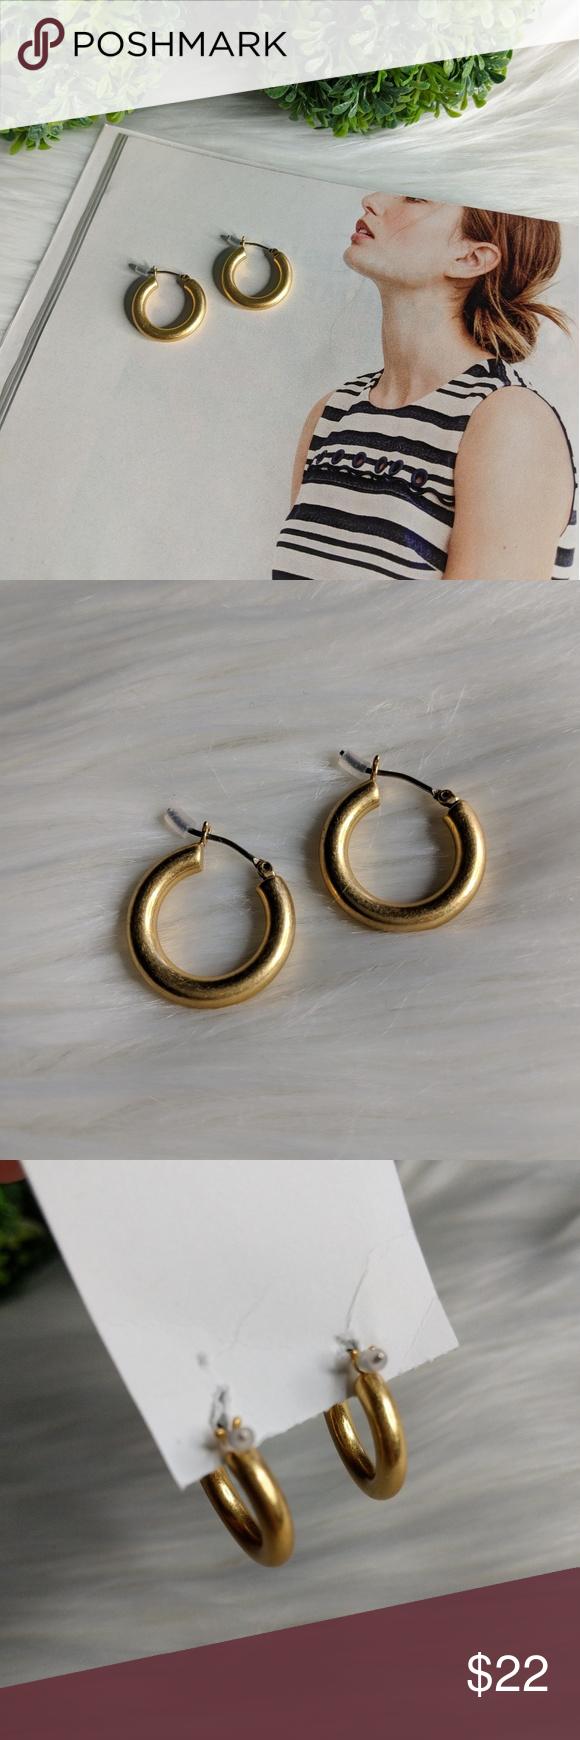 0dbfa02d6577ab Madewell Chunky Medium Hoop Earrings NWT. Medium Chunky brass earrings with  vintage vibe. Comes